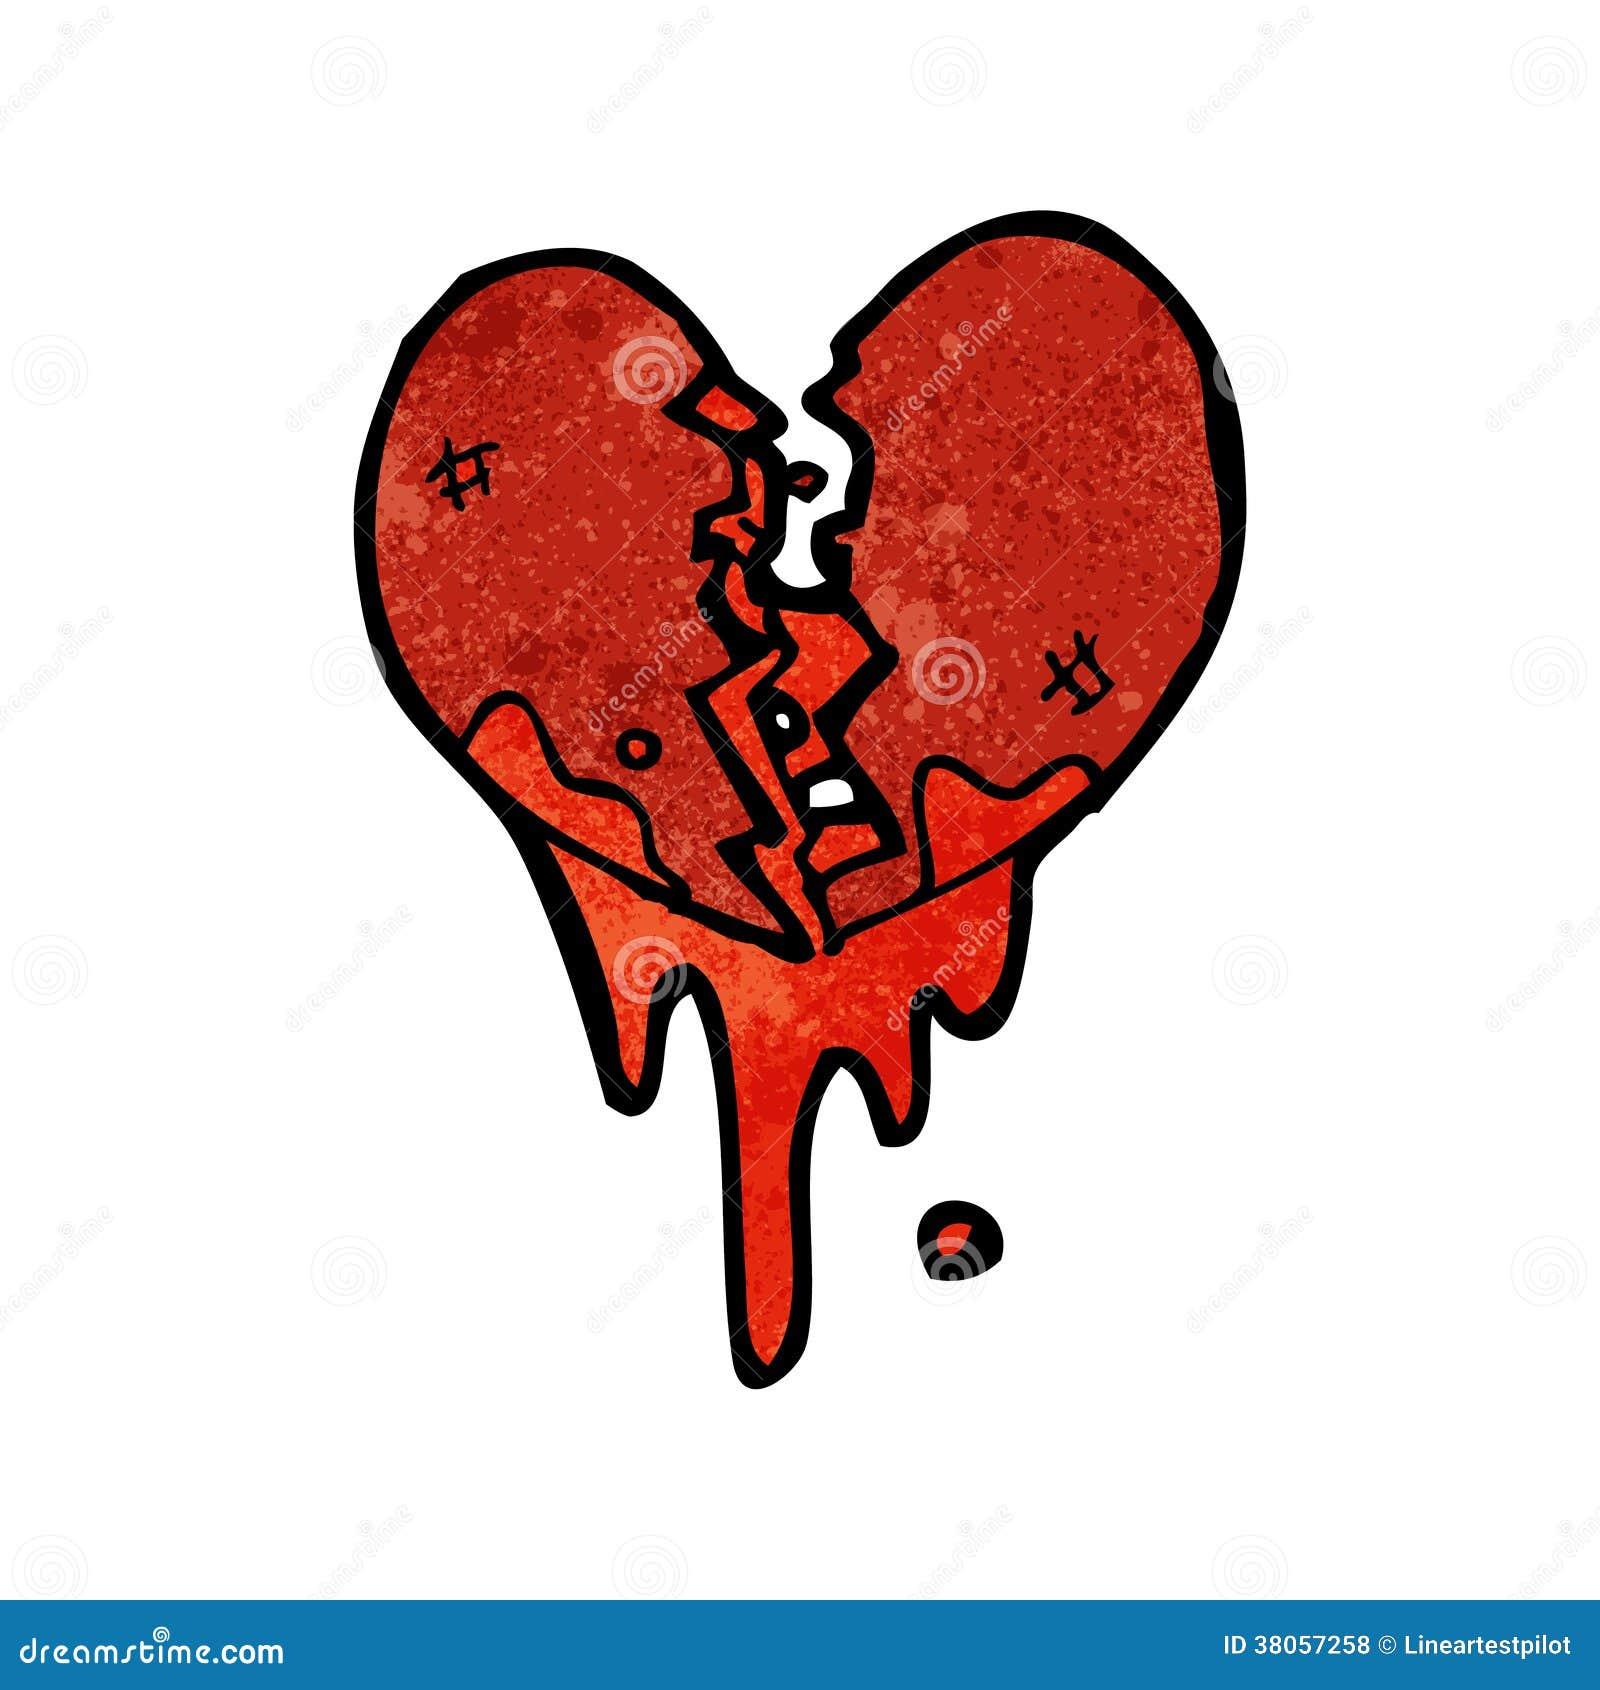 Blood Splattered Heart Cartoon Stock Vector Illustration Of